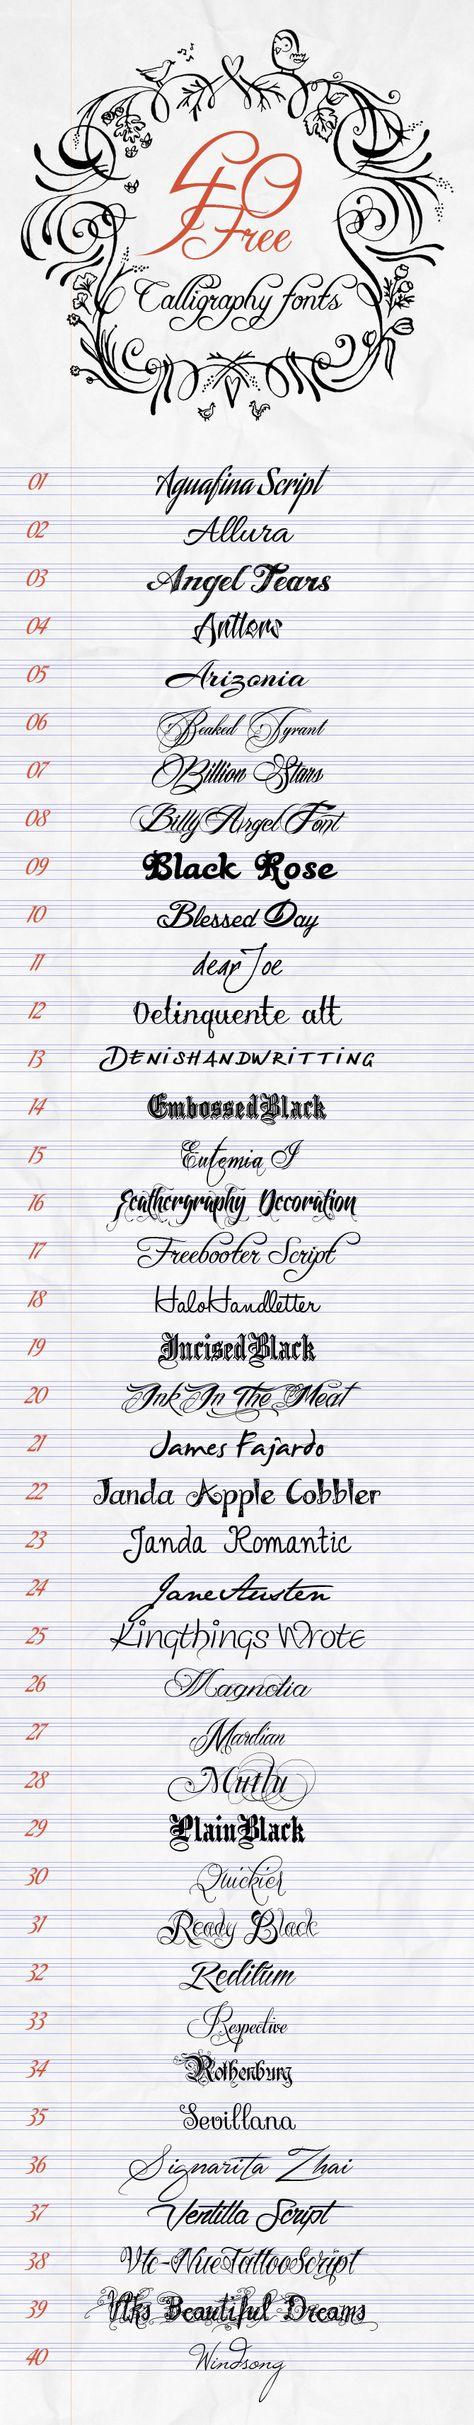 Free wedding calligraphy fonts